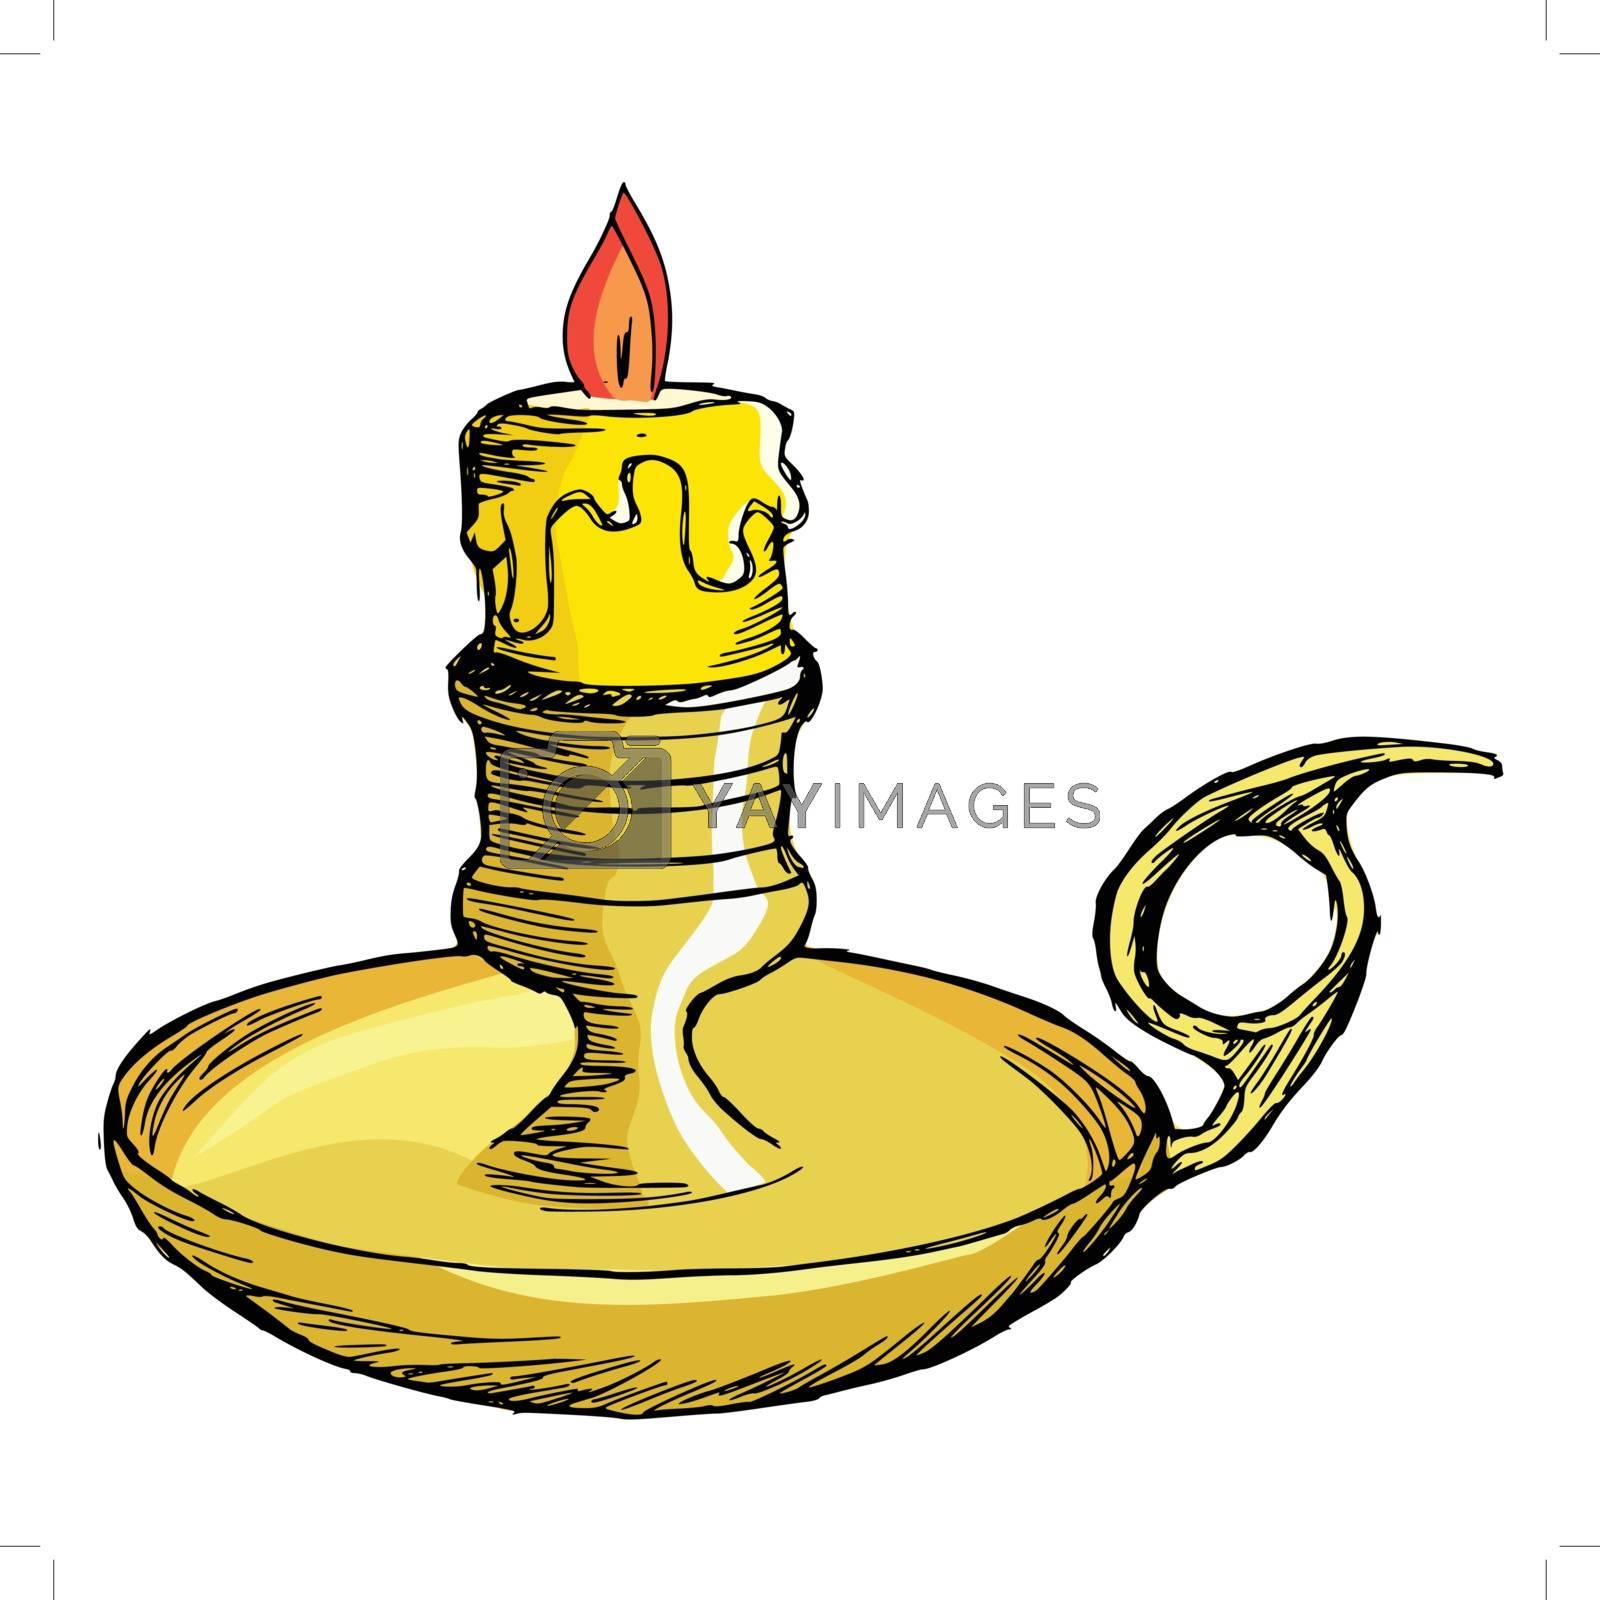 hand drawn, cartoon, sketch illustration of candlestick mantel